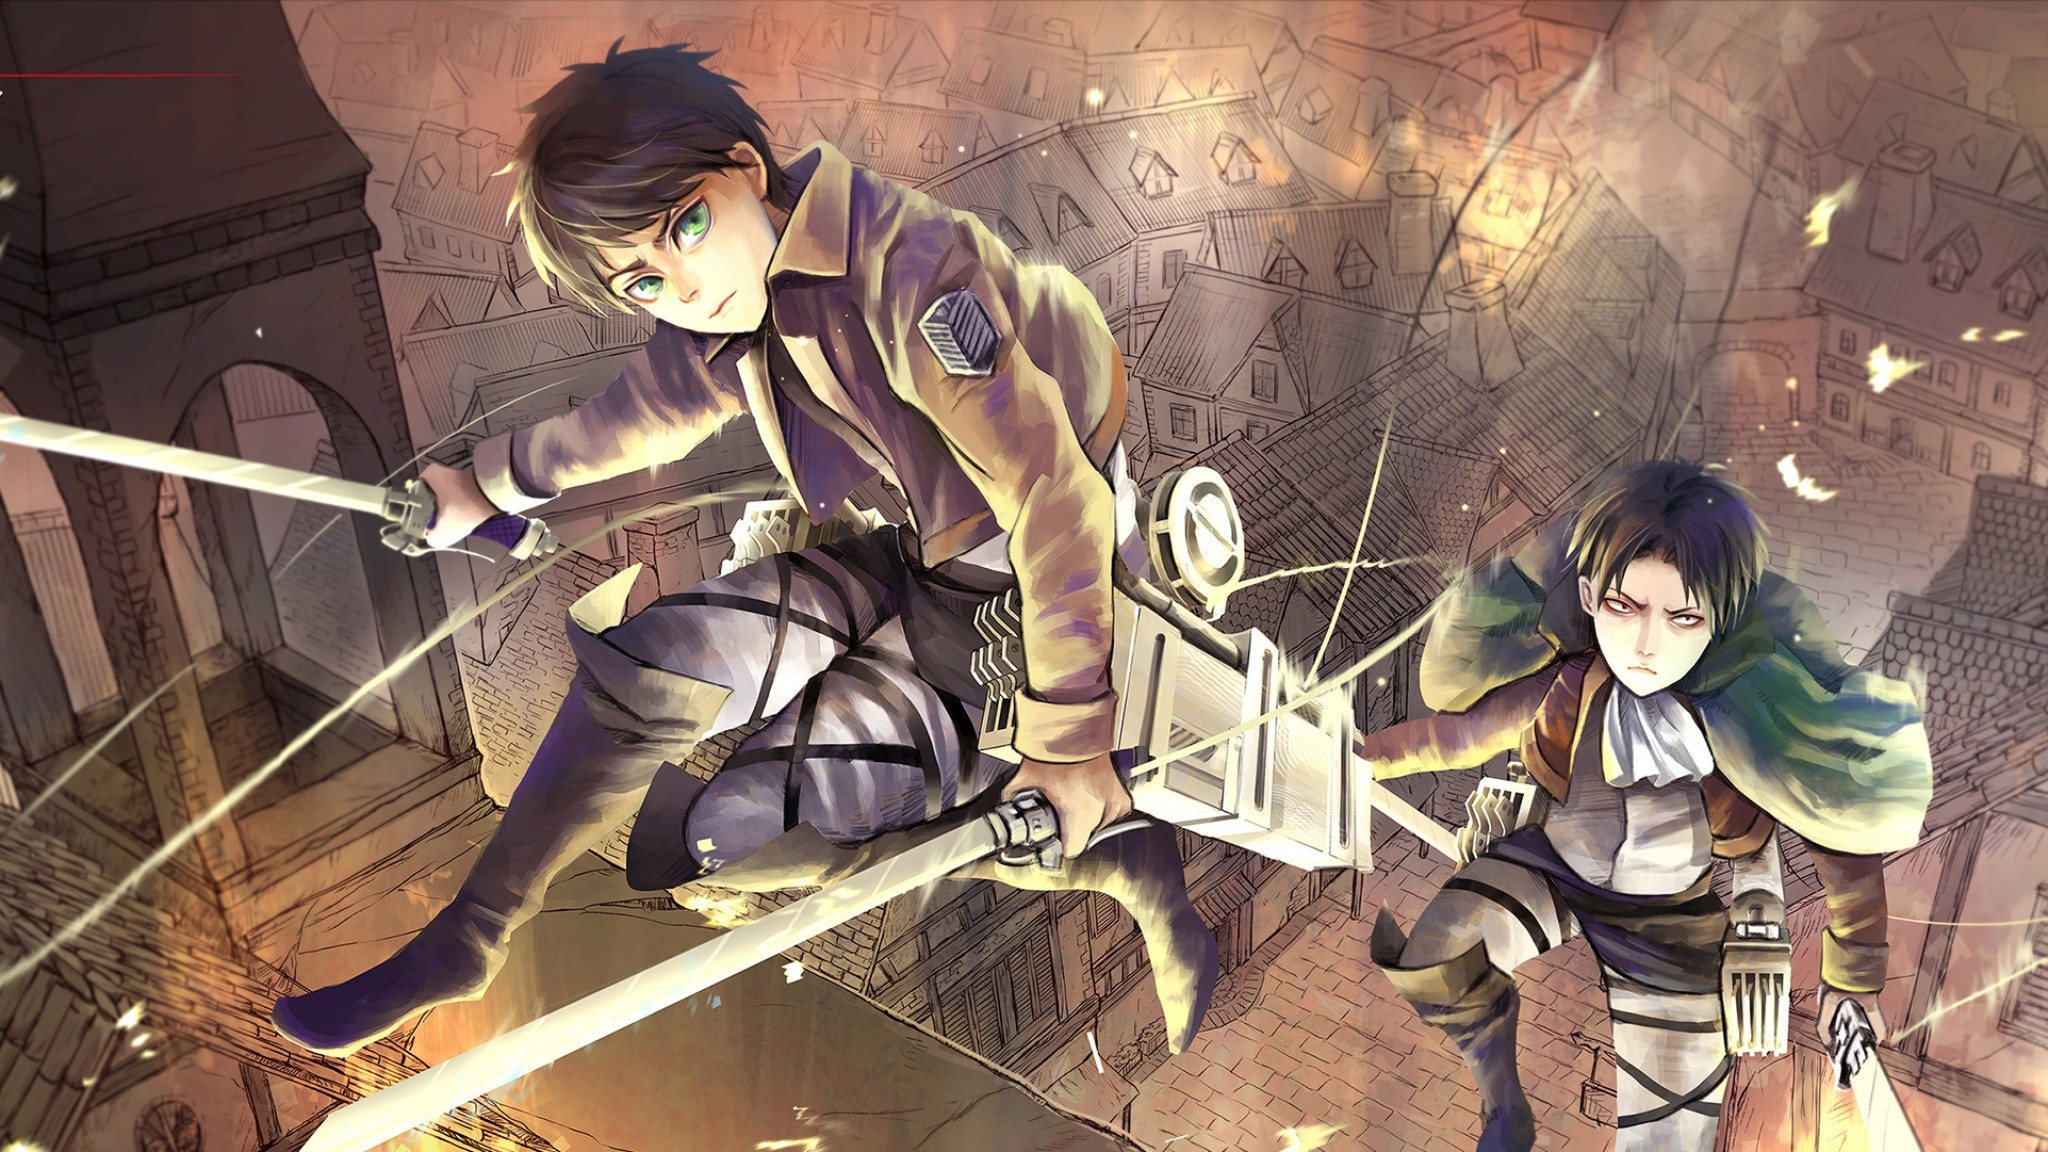 Preview wallpaper attack on titan, shingeki no kyojin, eren jaeger, anime,  art